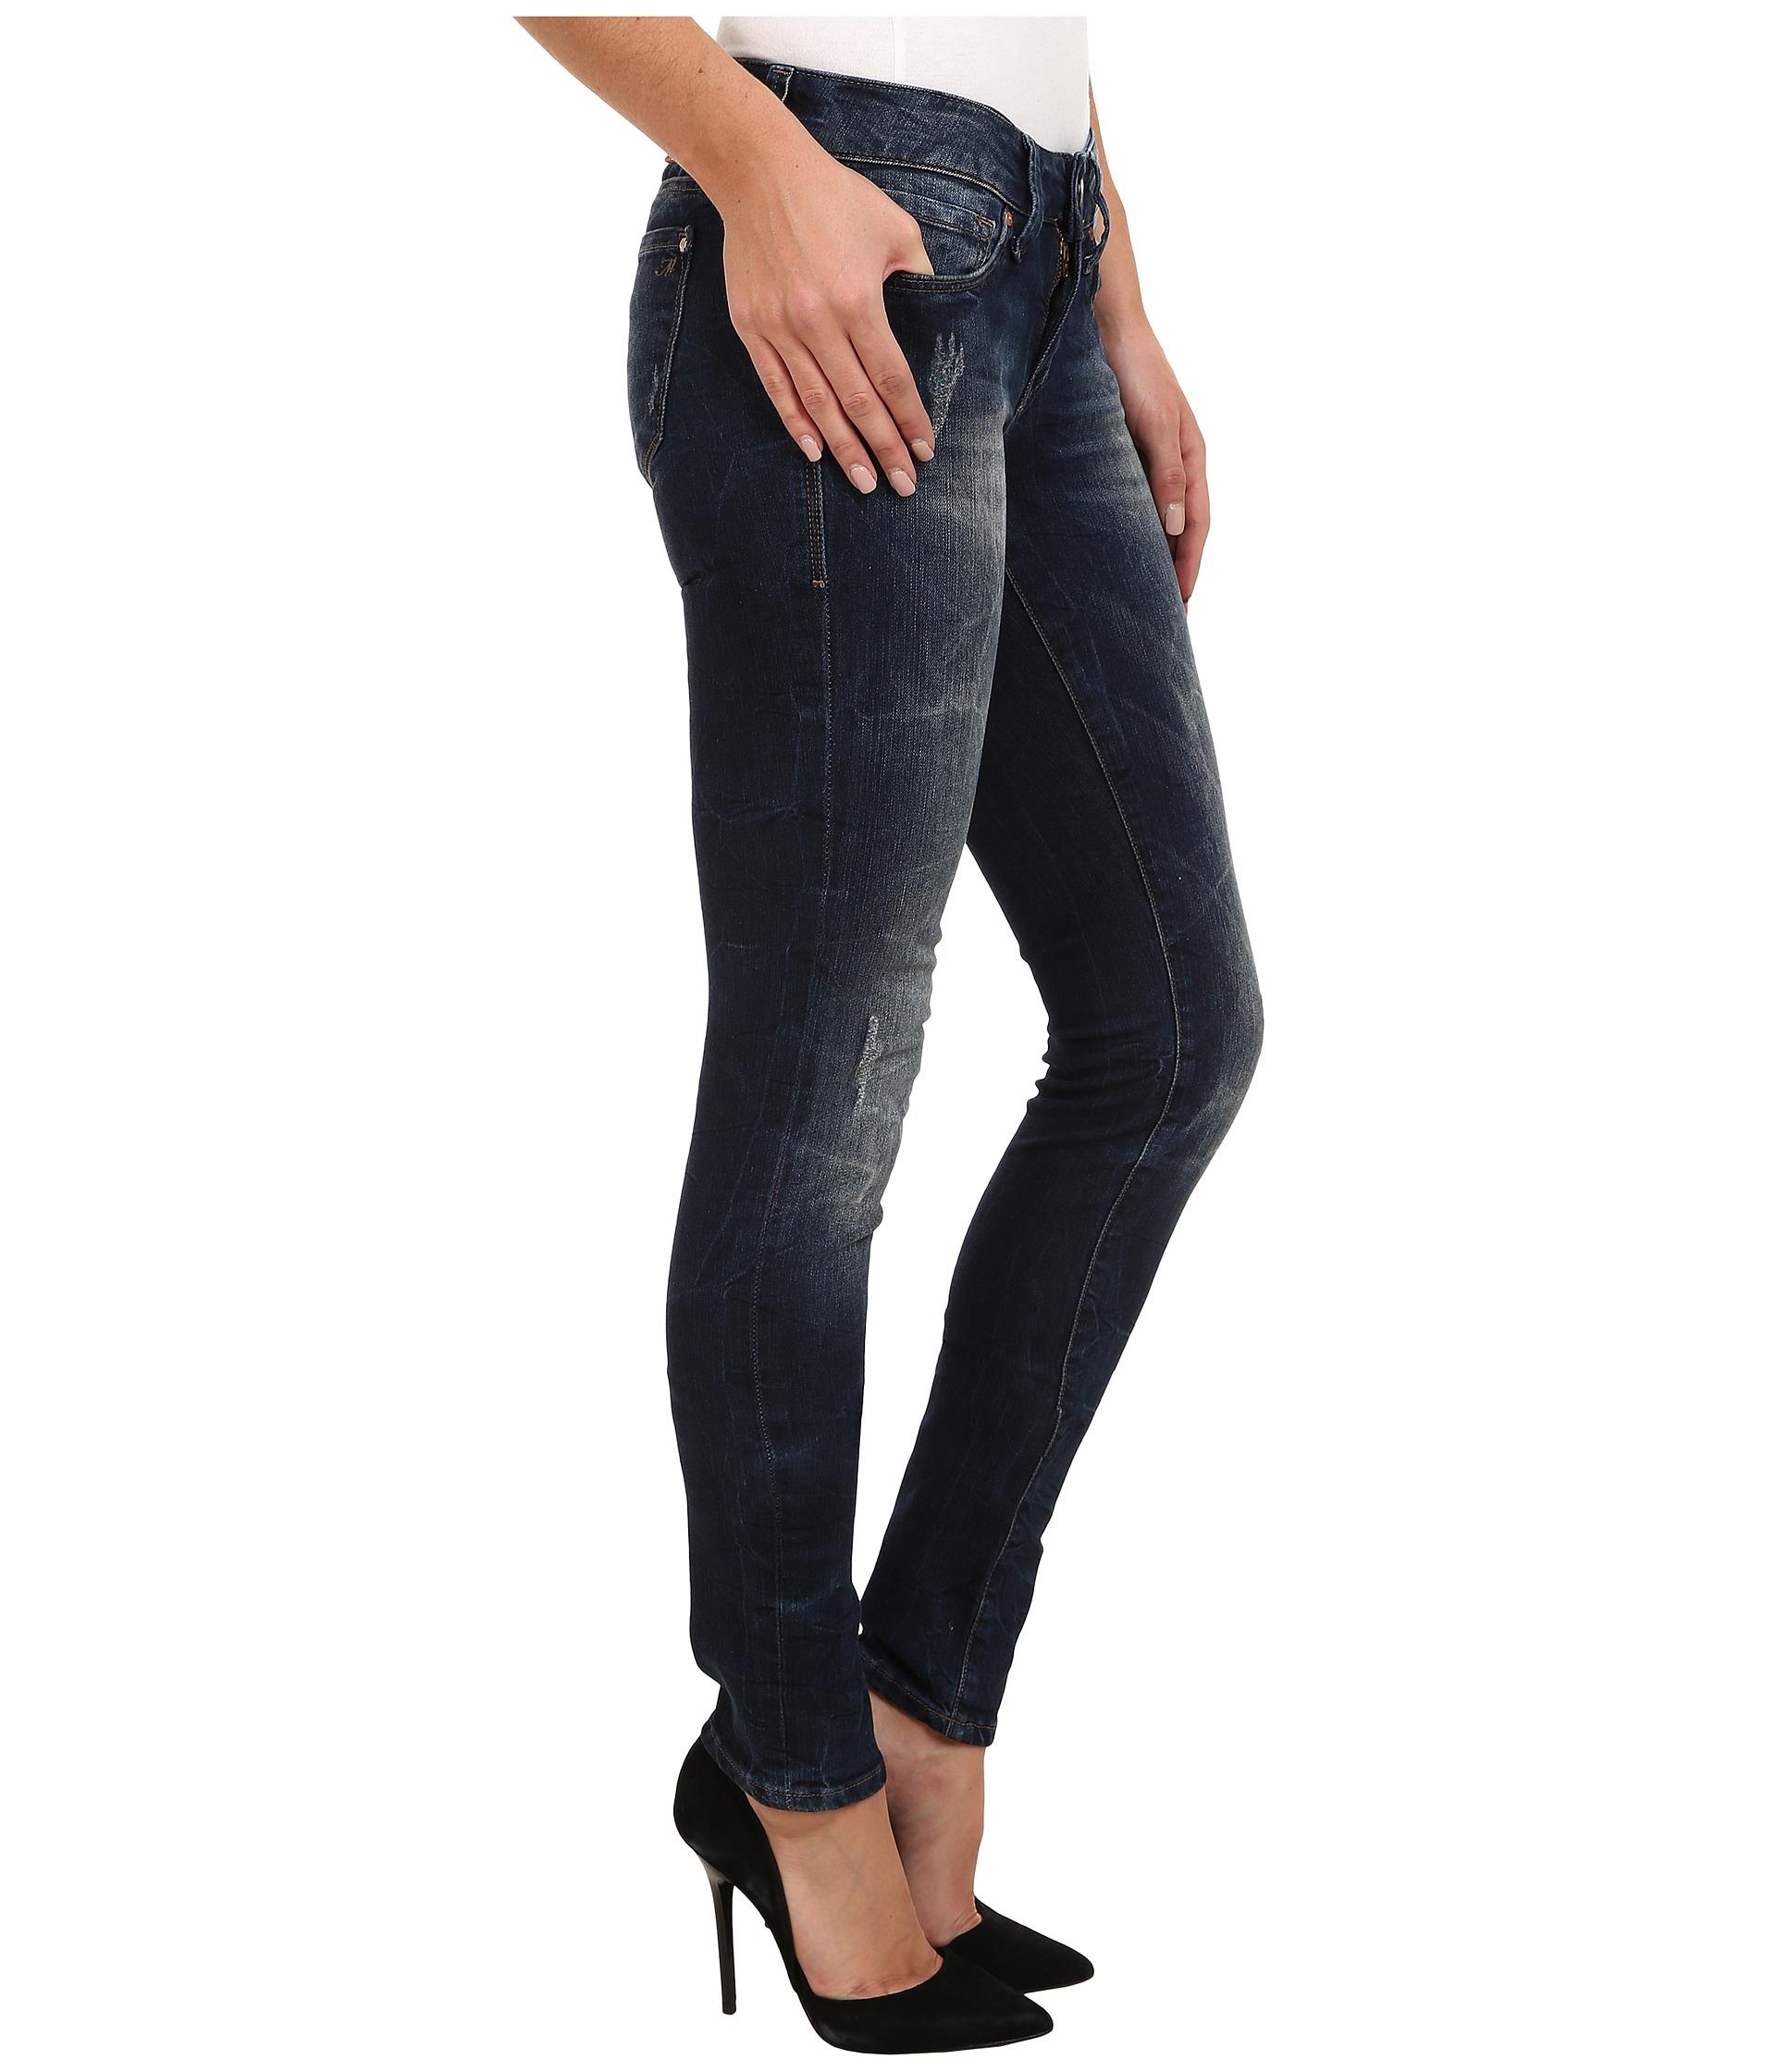 lyst mavi jeans serena lowrise super skinny in dark used. Black Bedroom Furniture Sets. Home Design Ideas